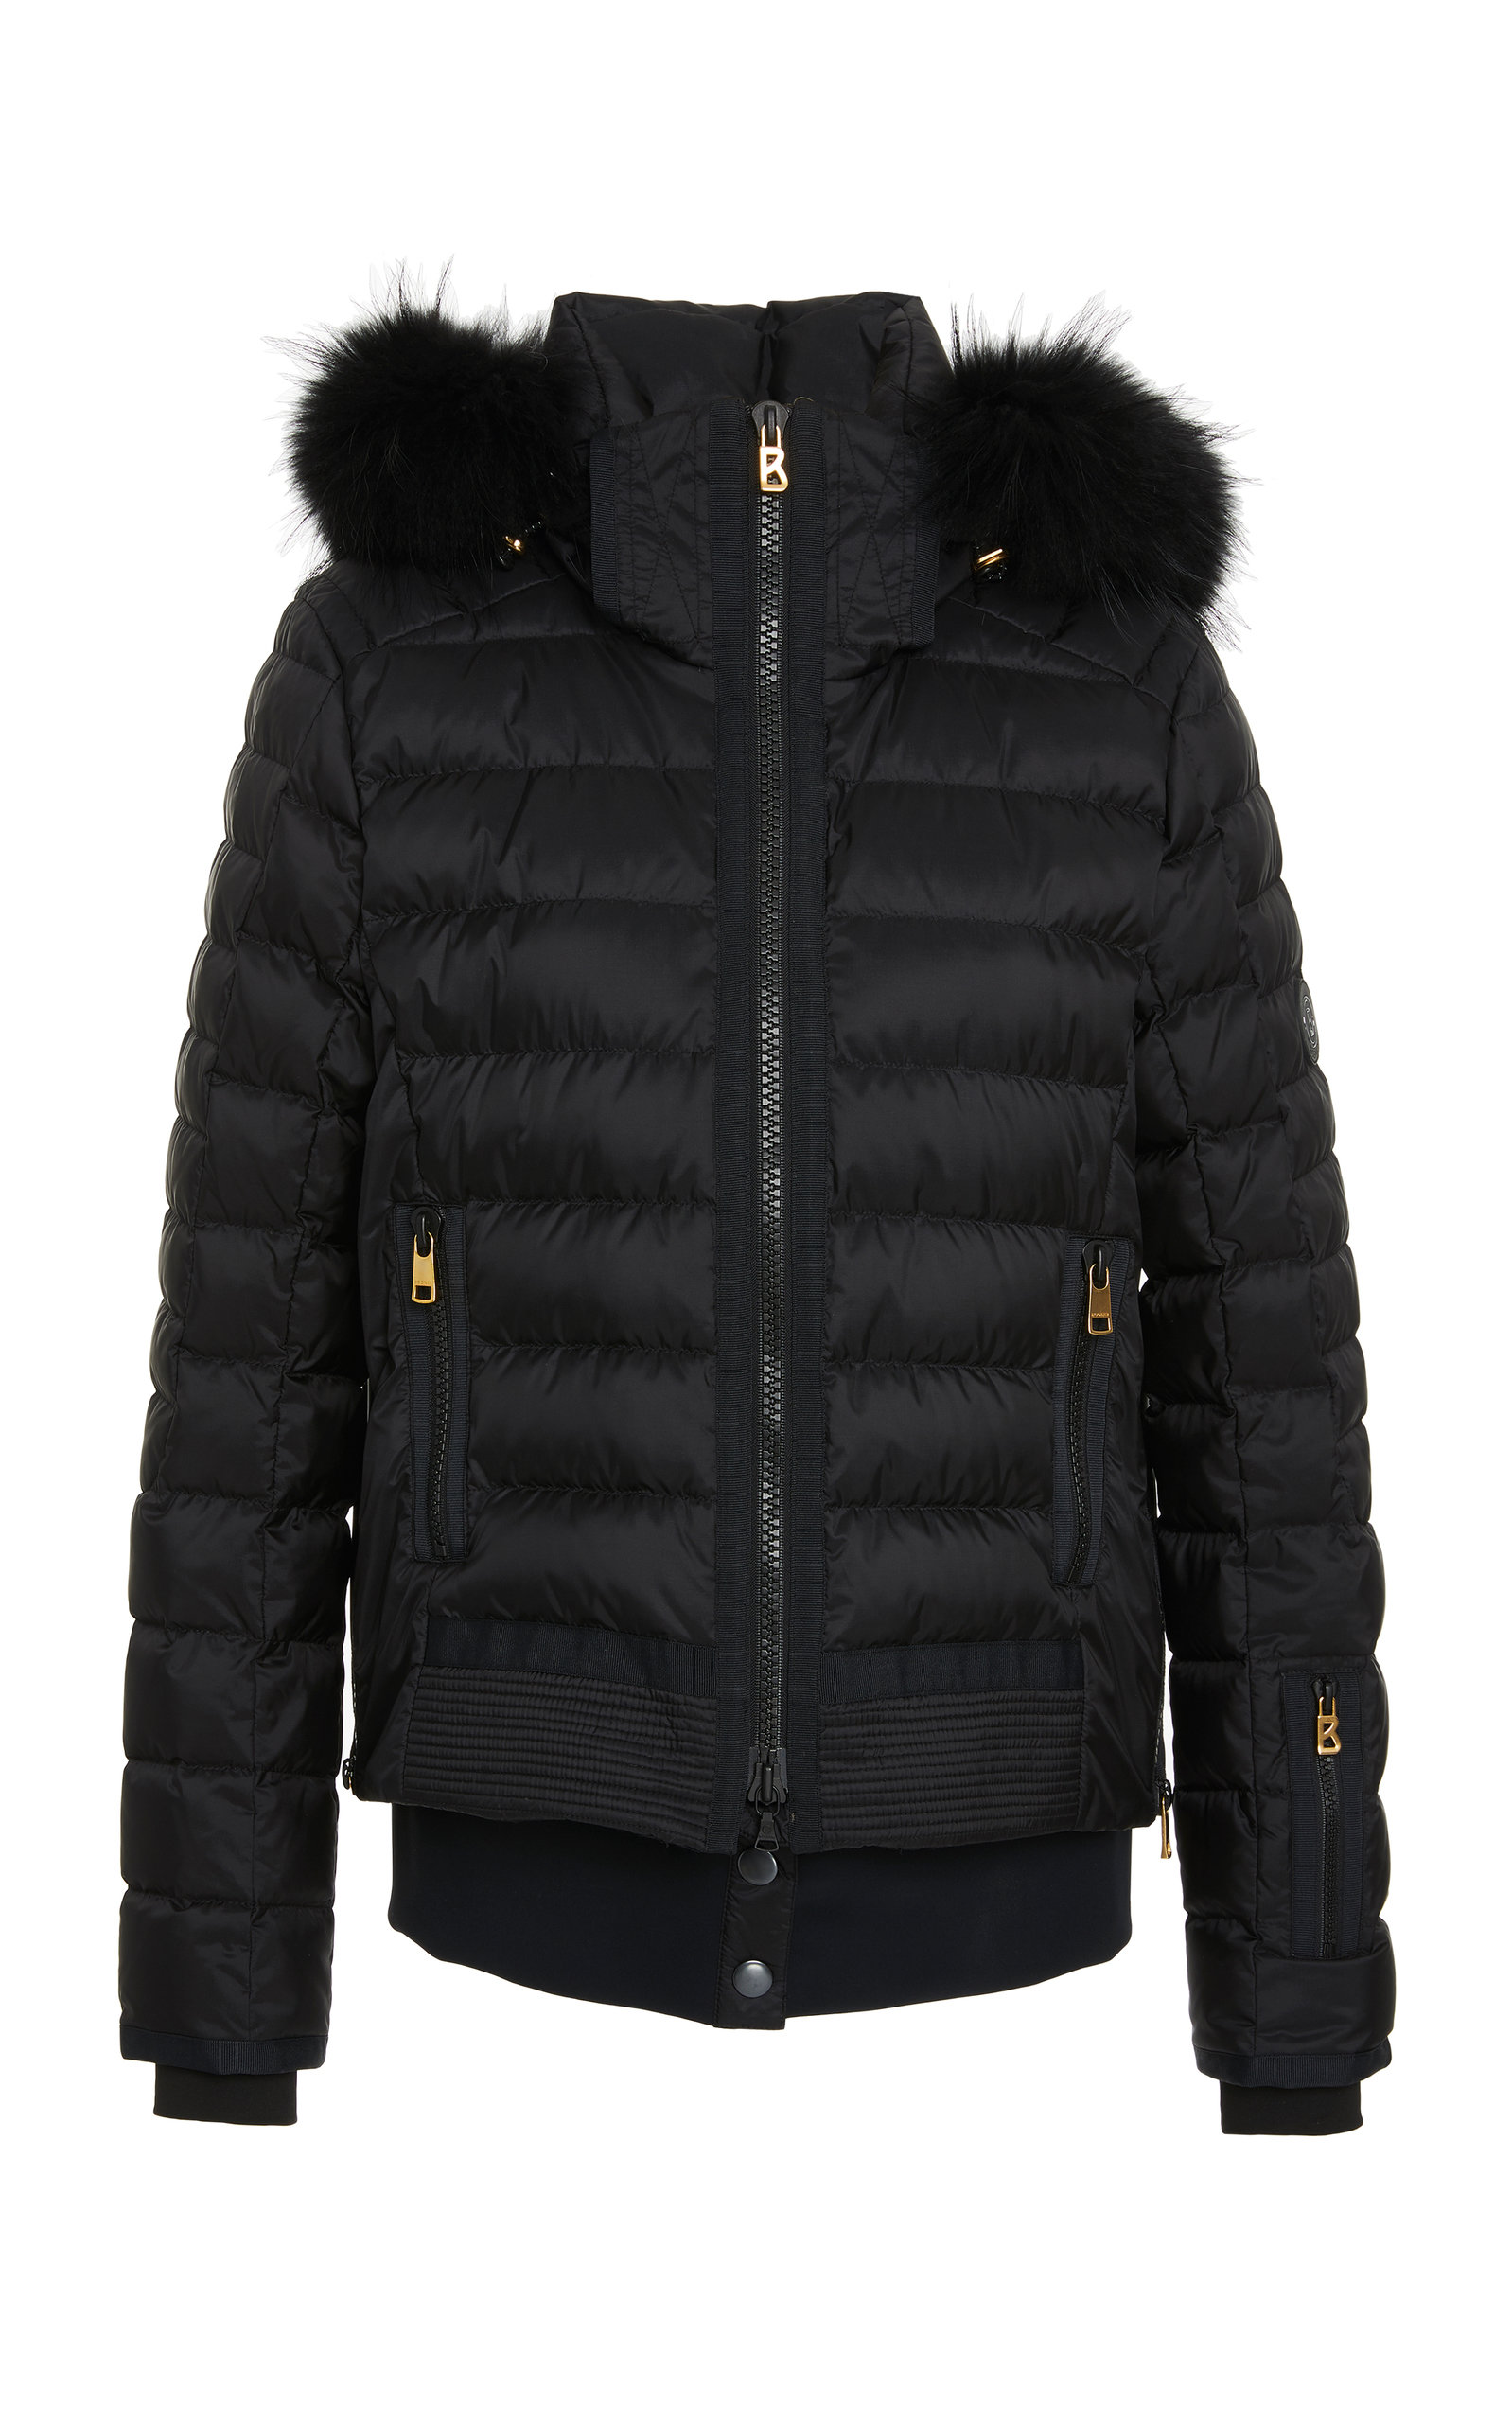 Muriel D Fur-Trimmed Shell Jacket in Black